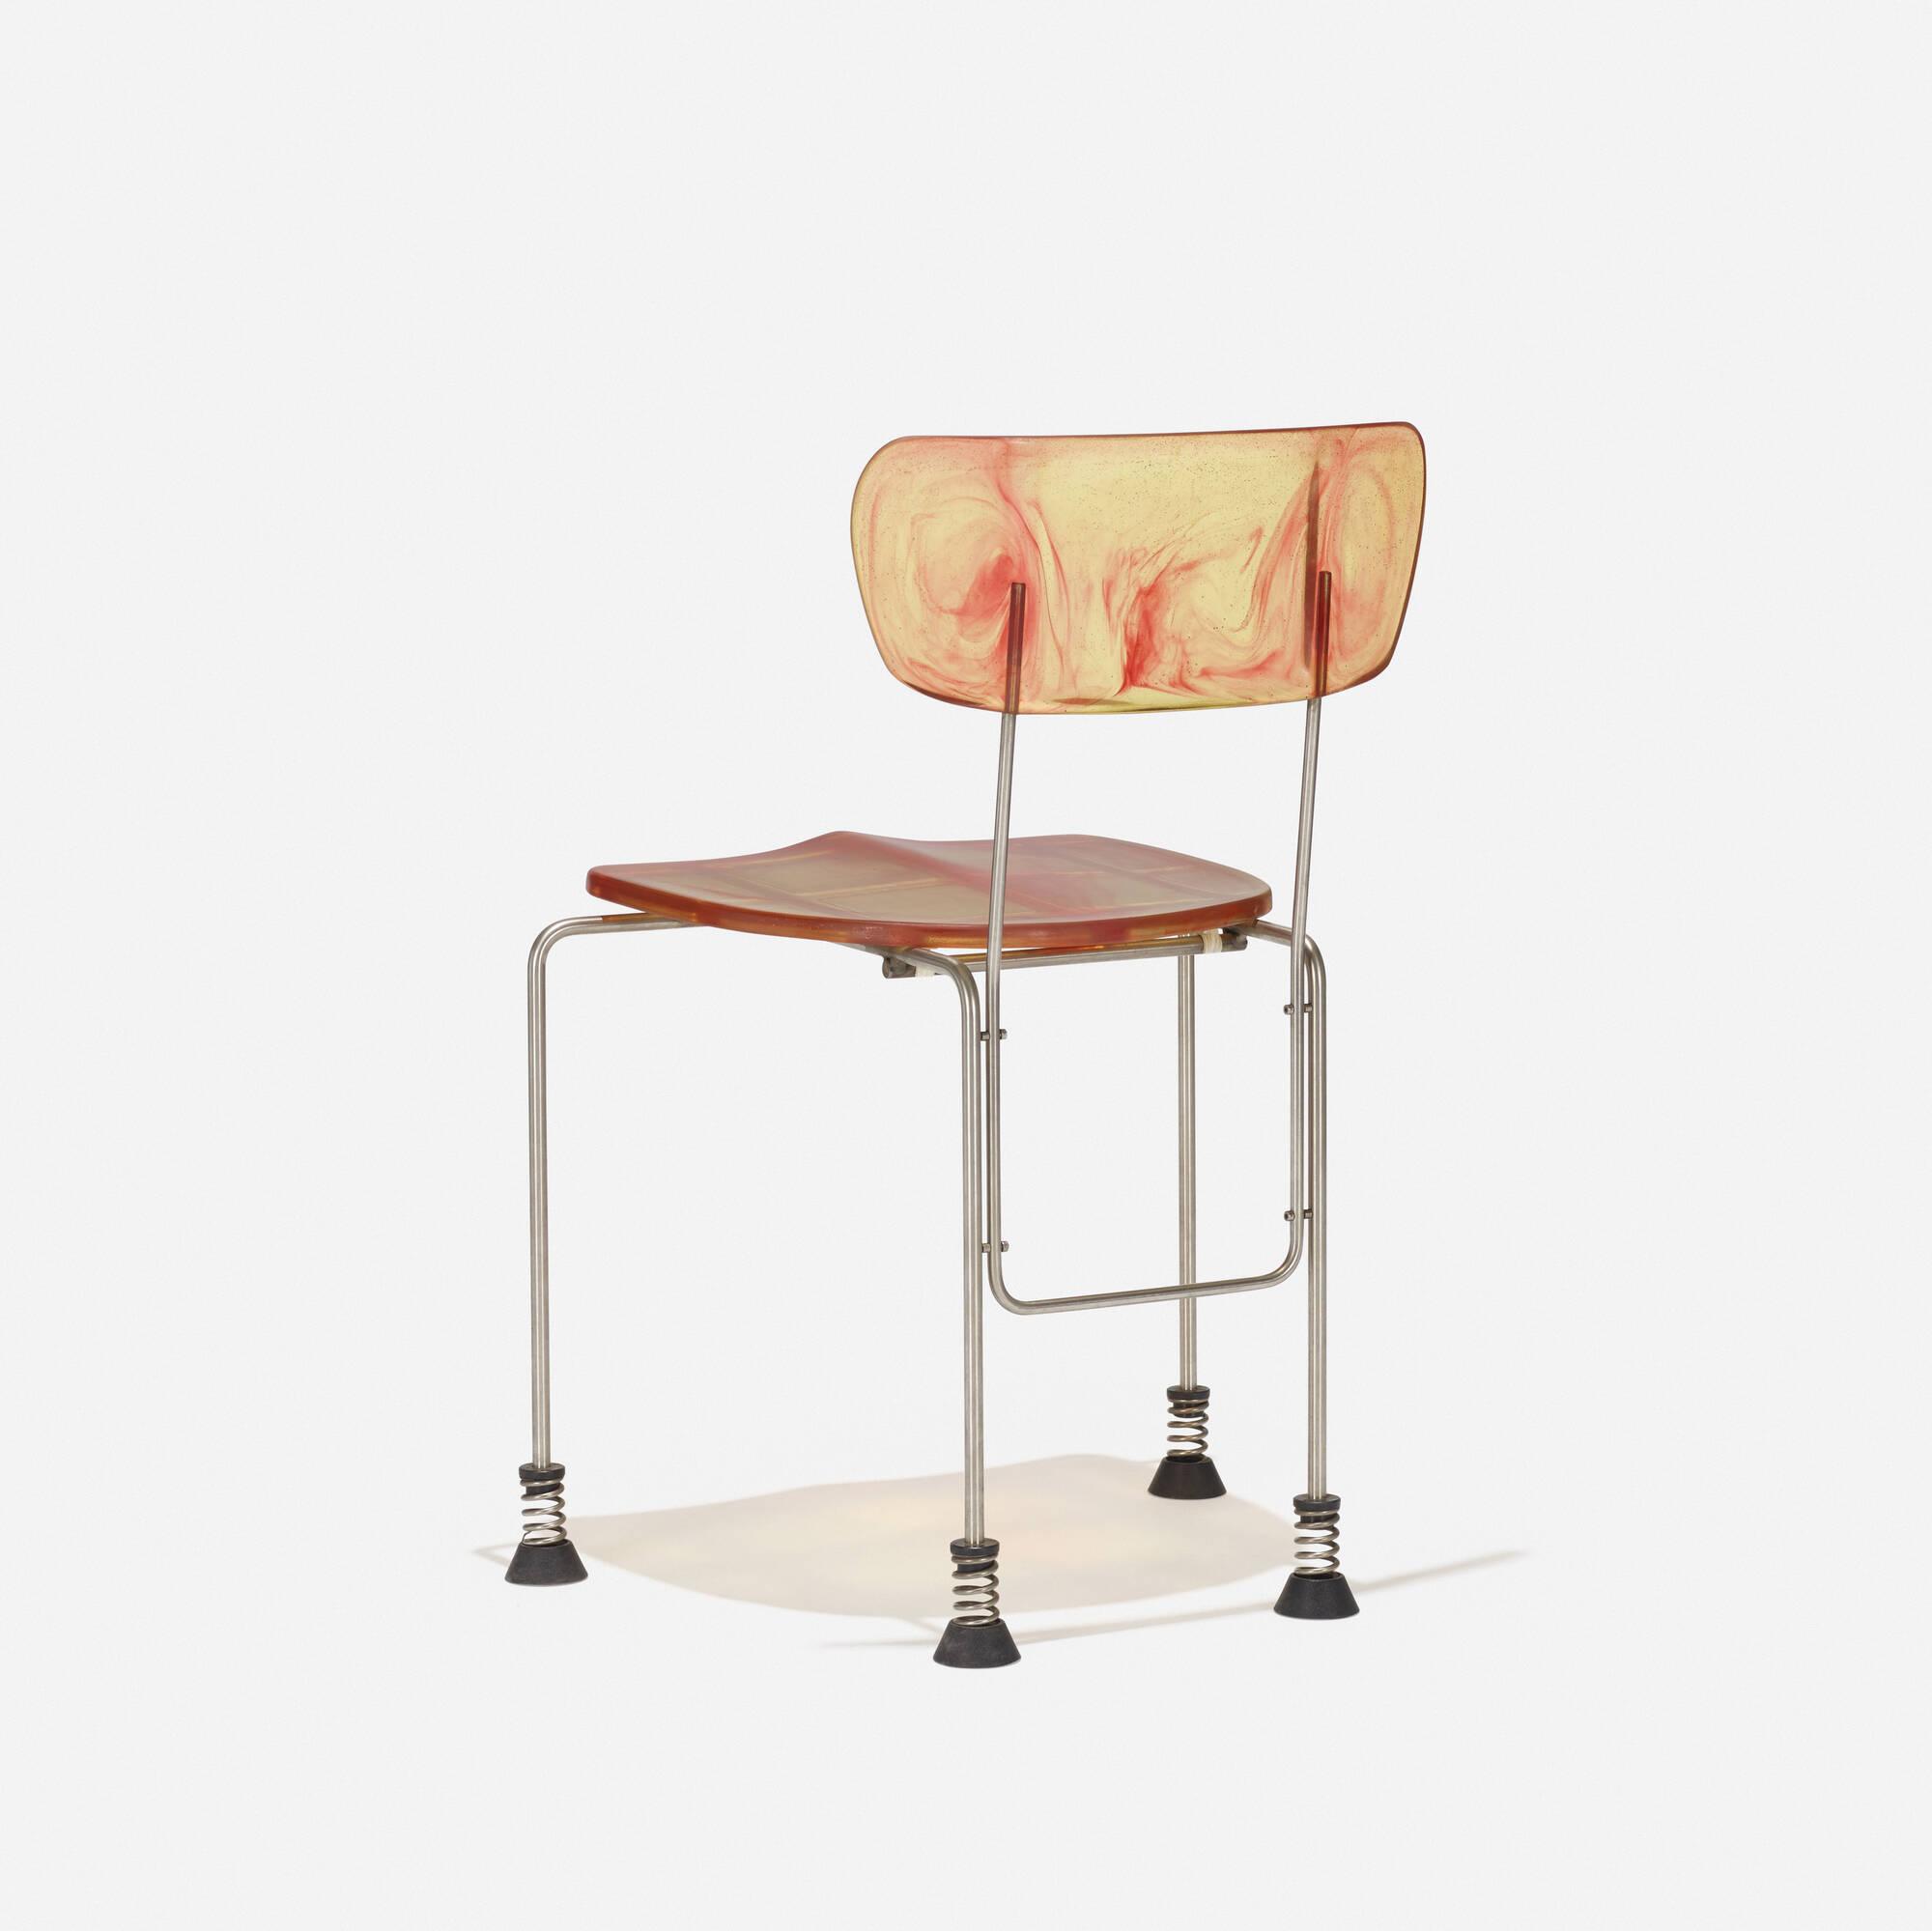 327: Gaetano Pesce / 543 Broadway chair (3 of 4)